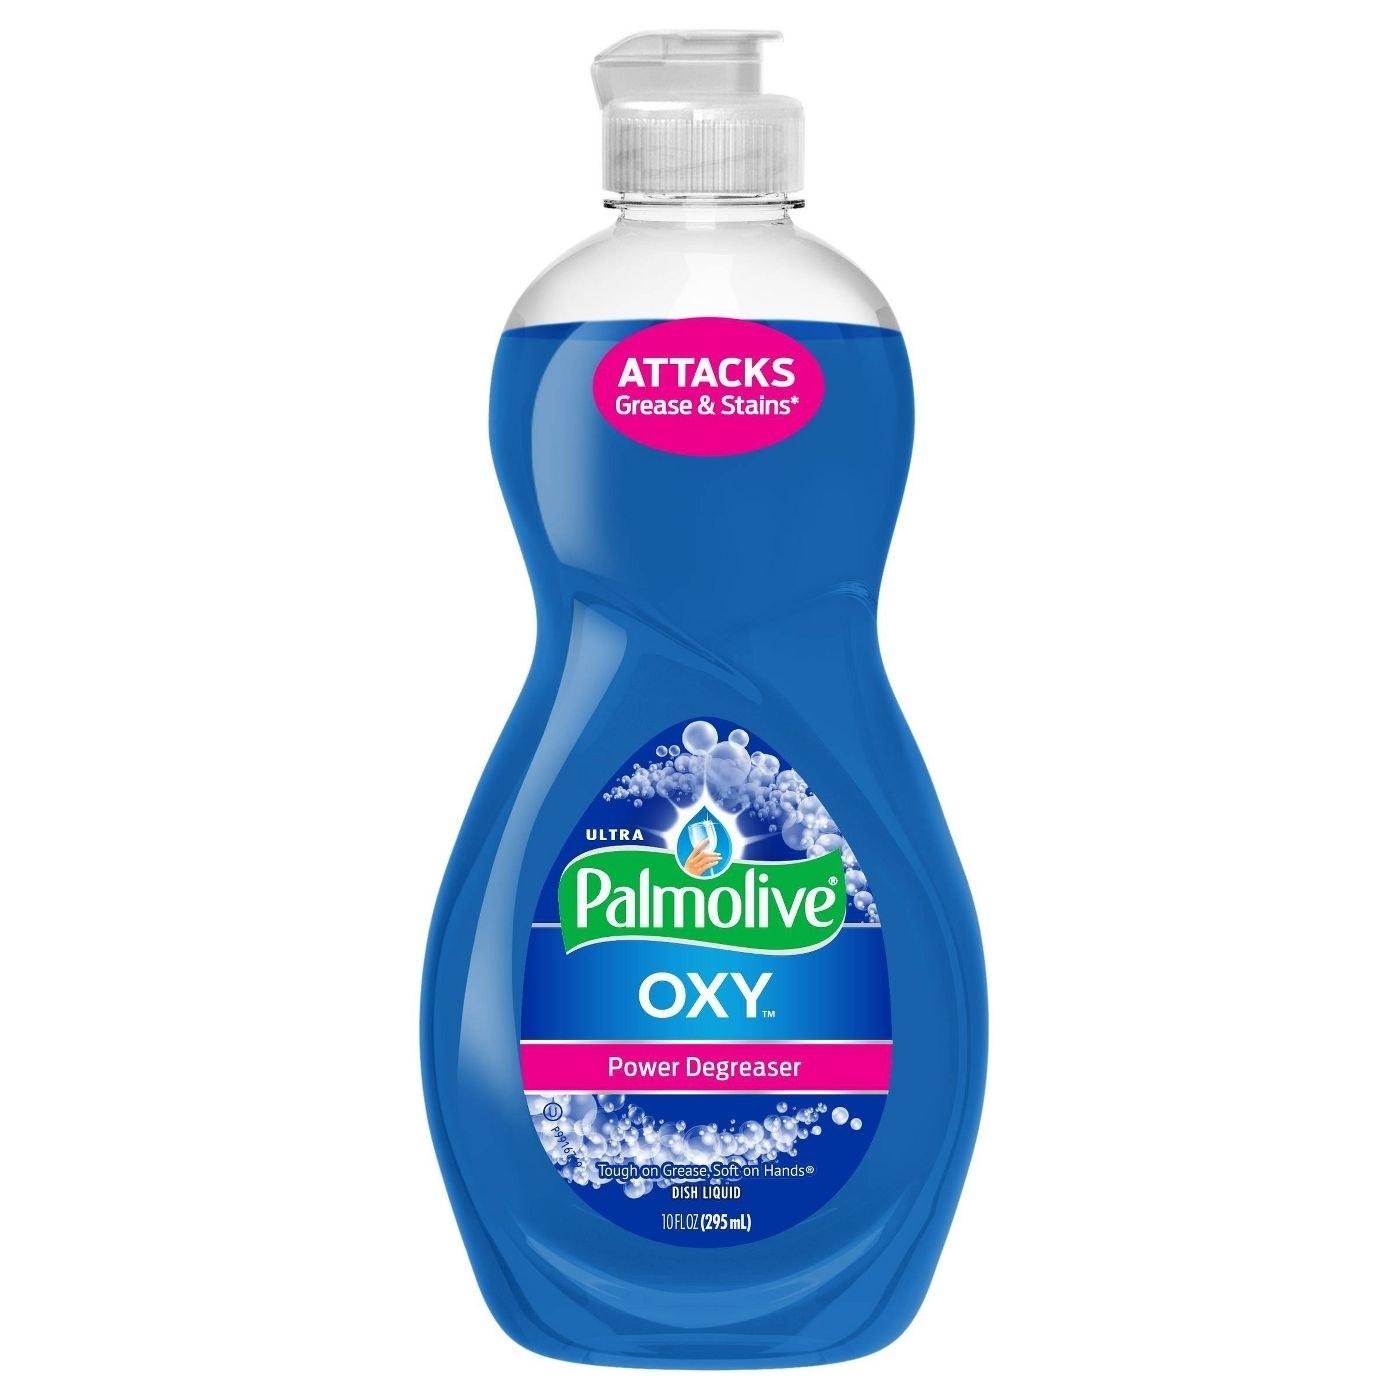 The dish soap bottle